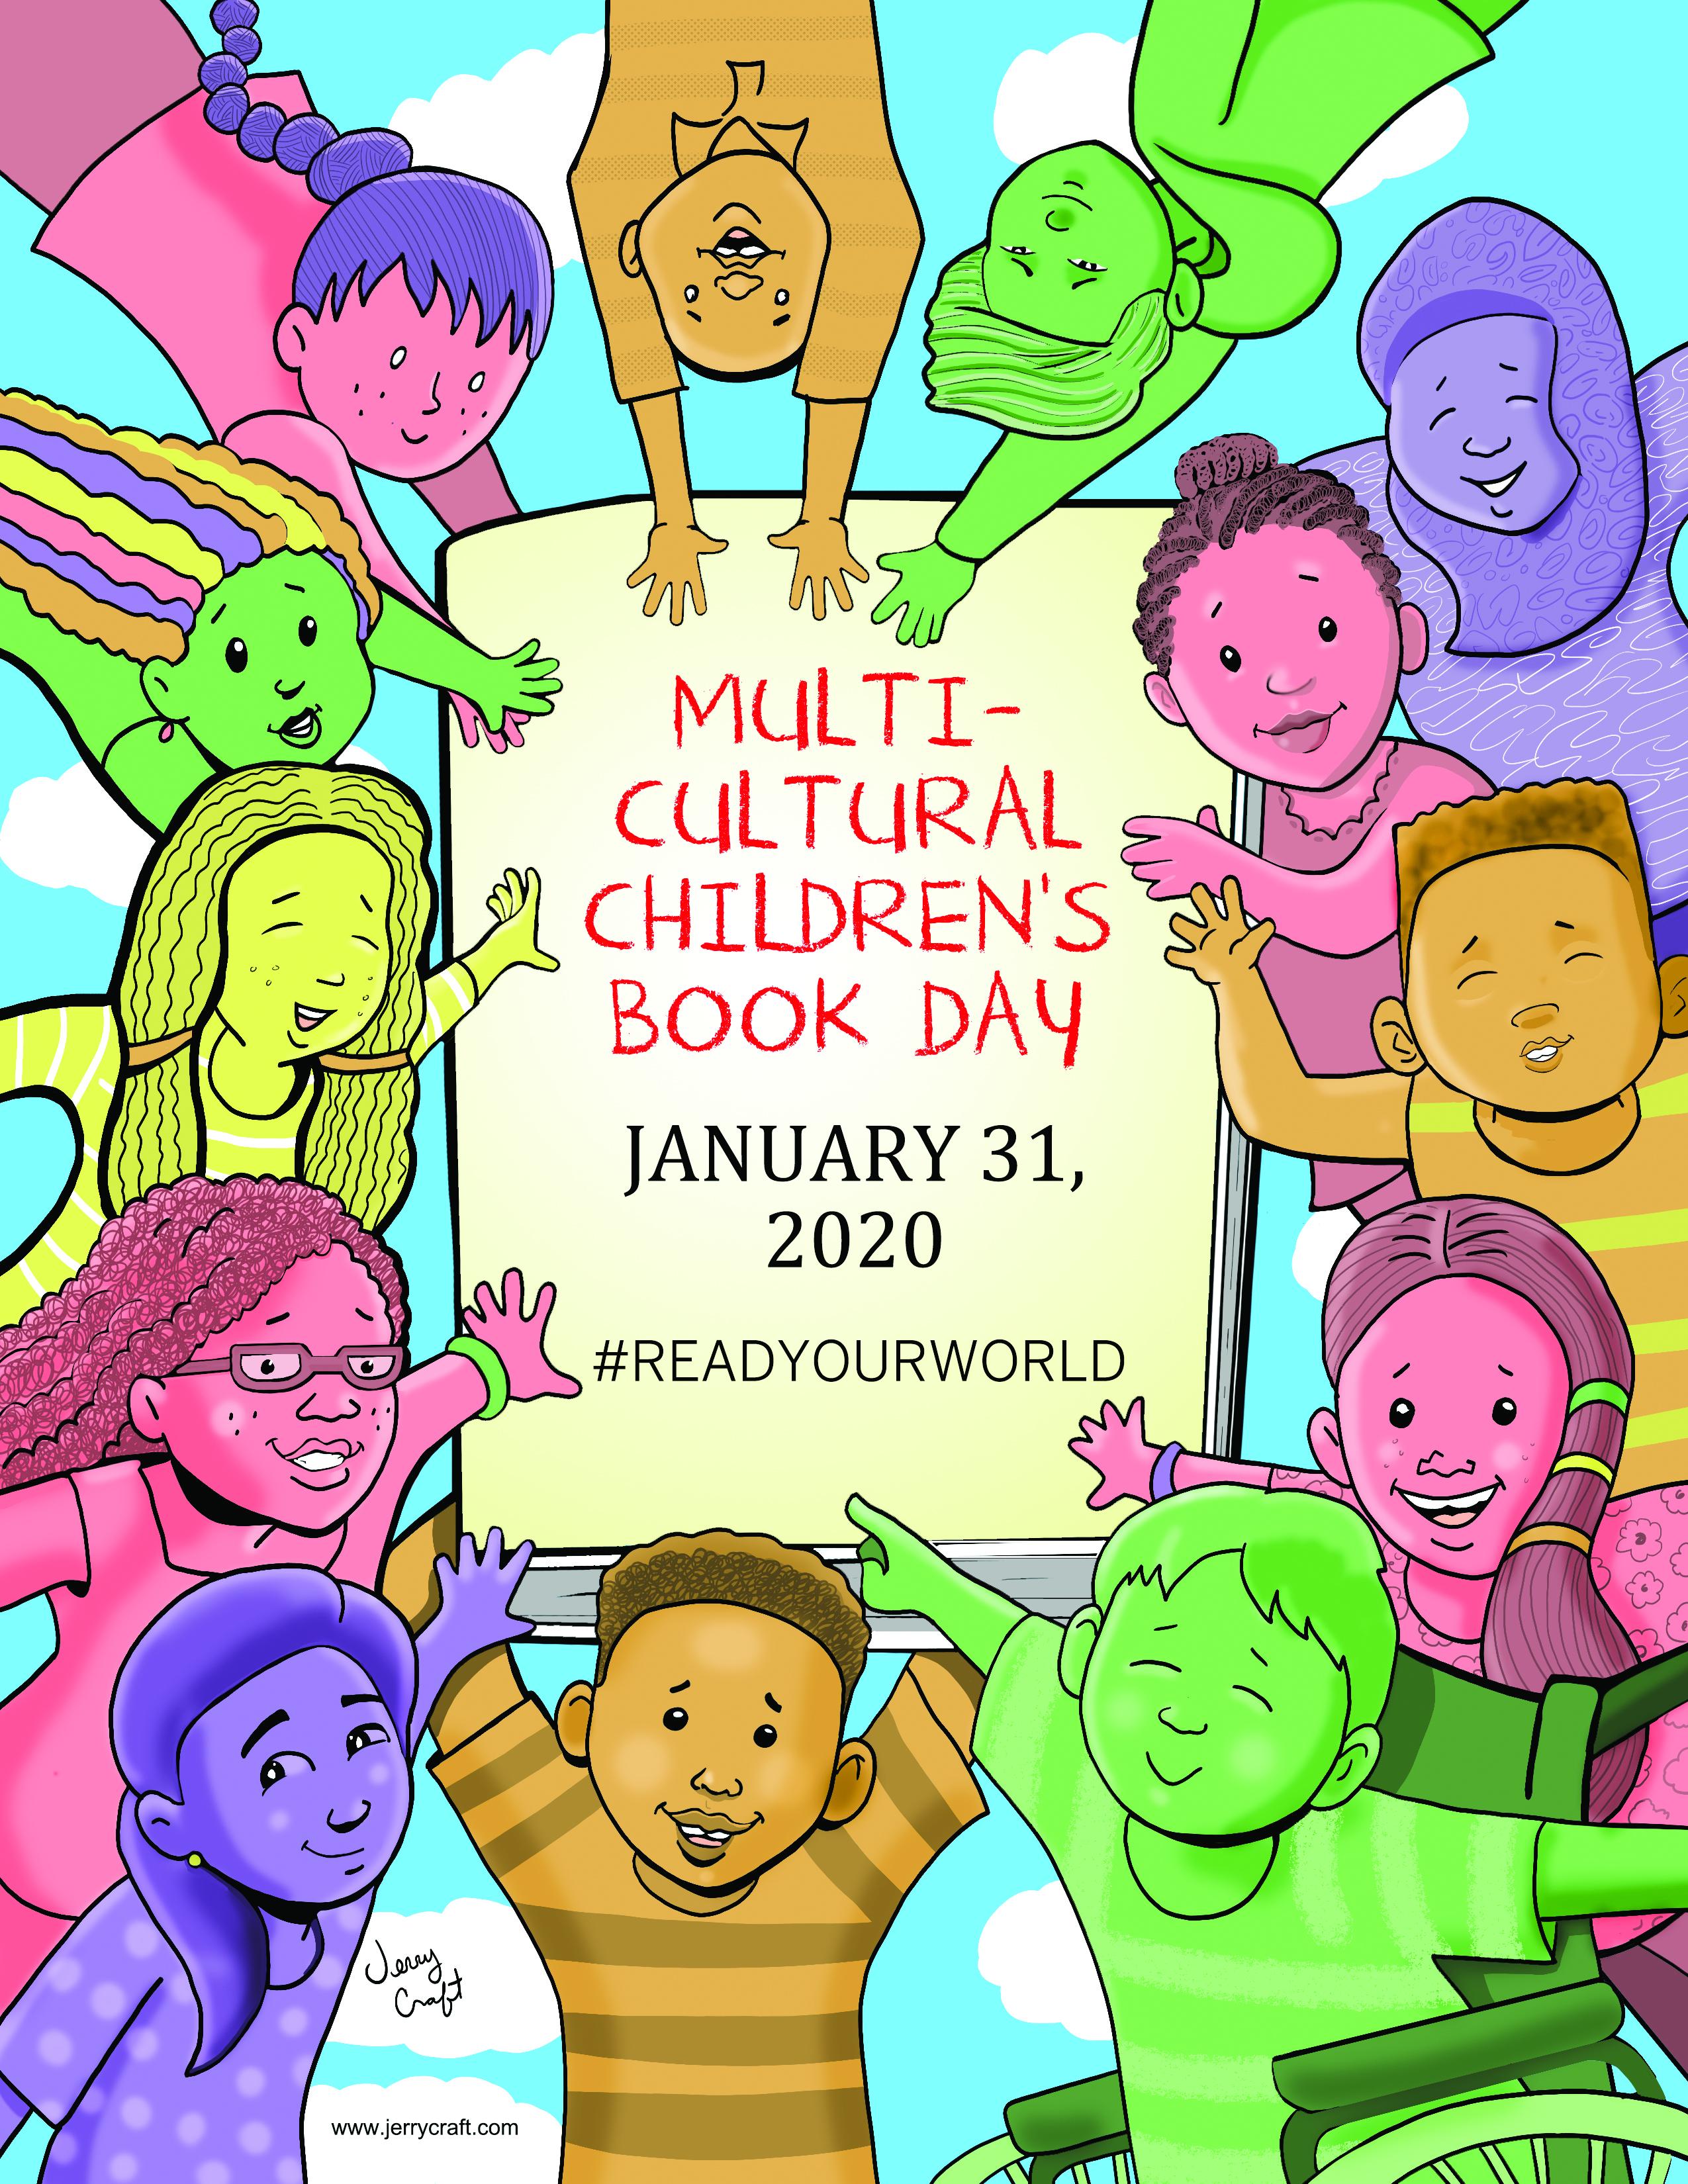 MultiCulturalChildrensBookDay 2020 poster